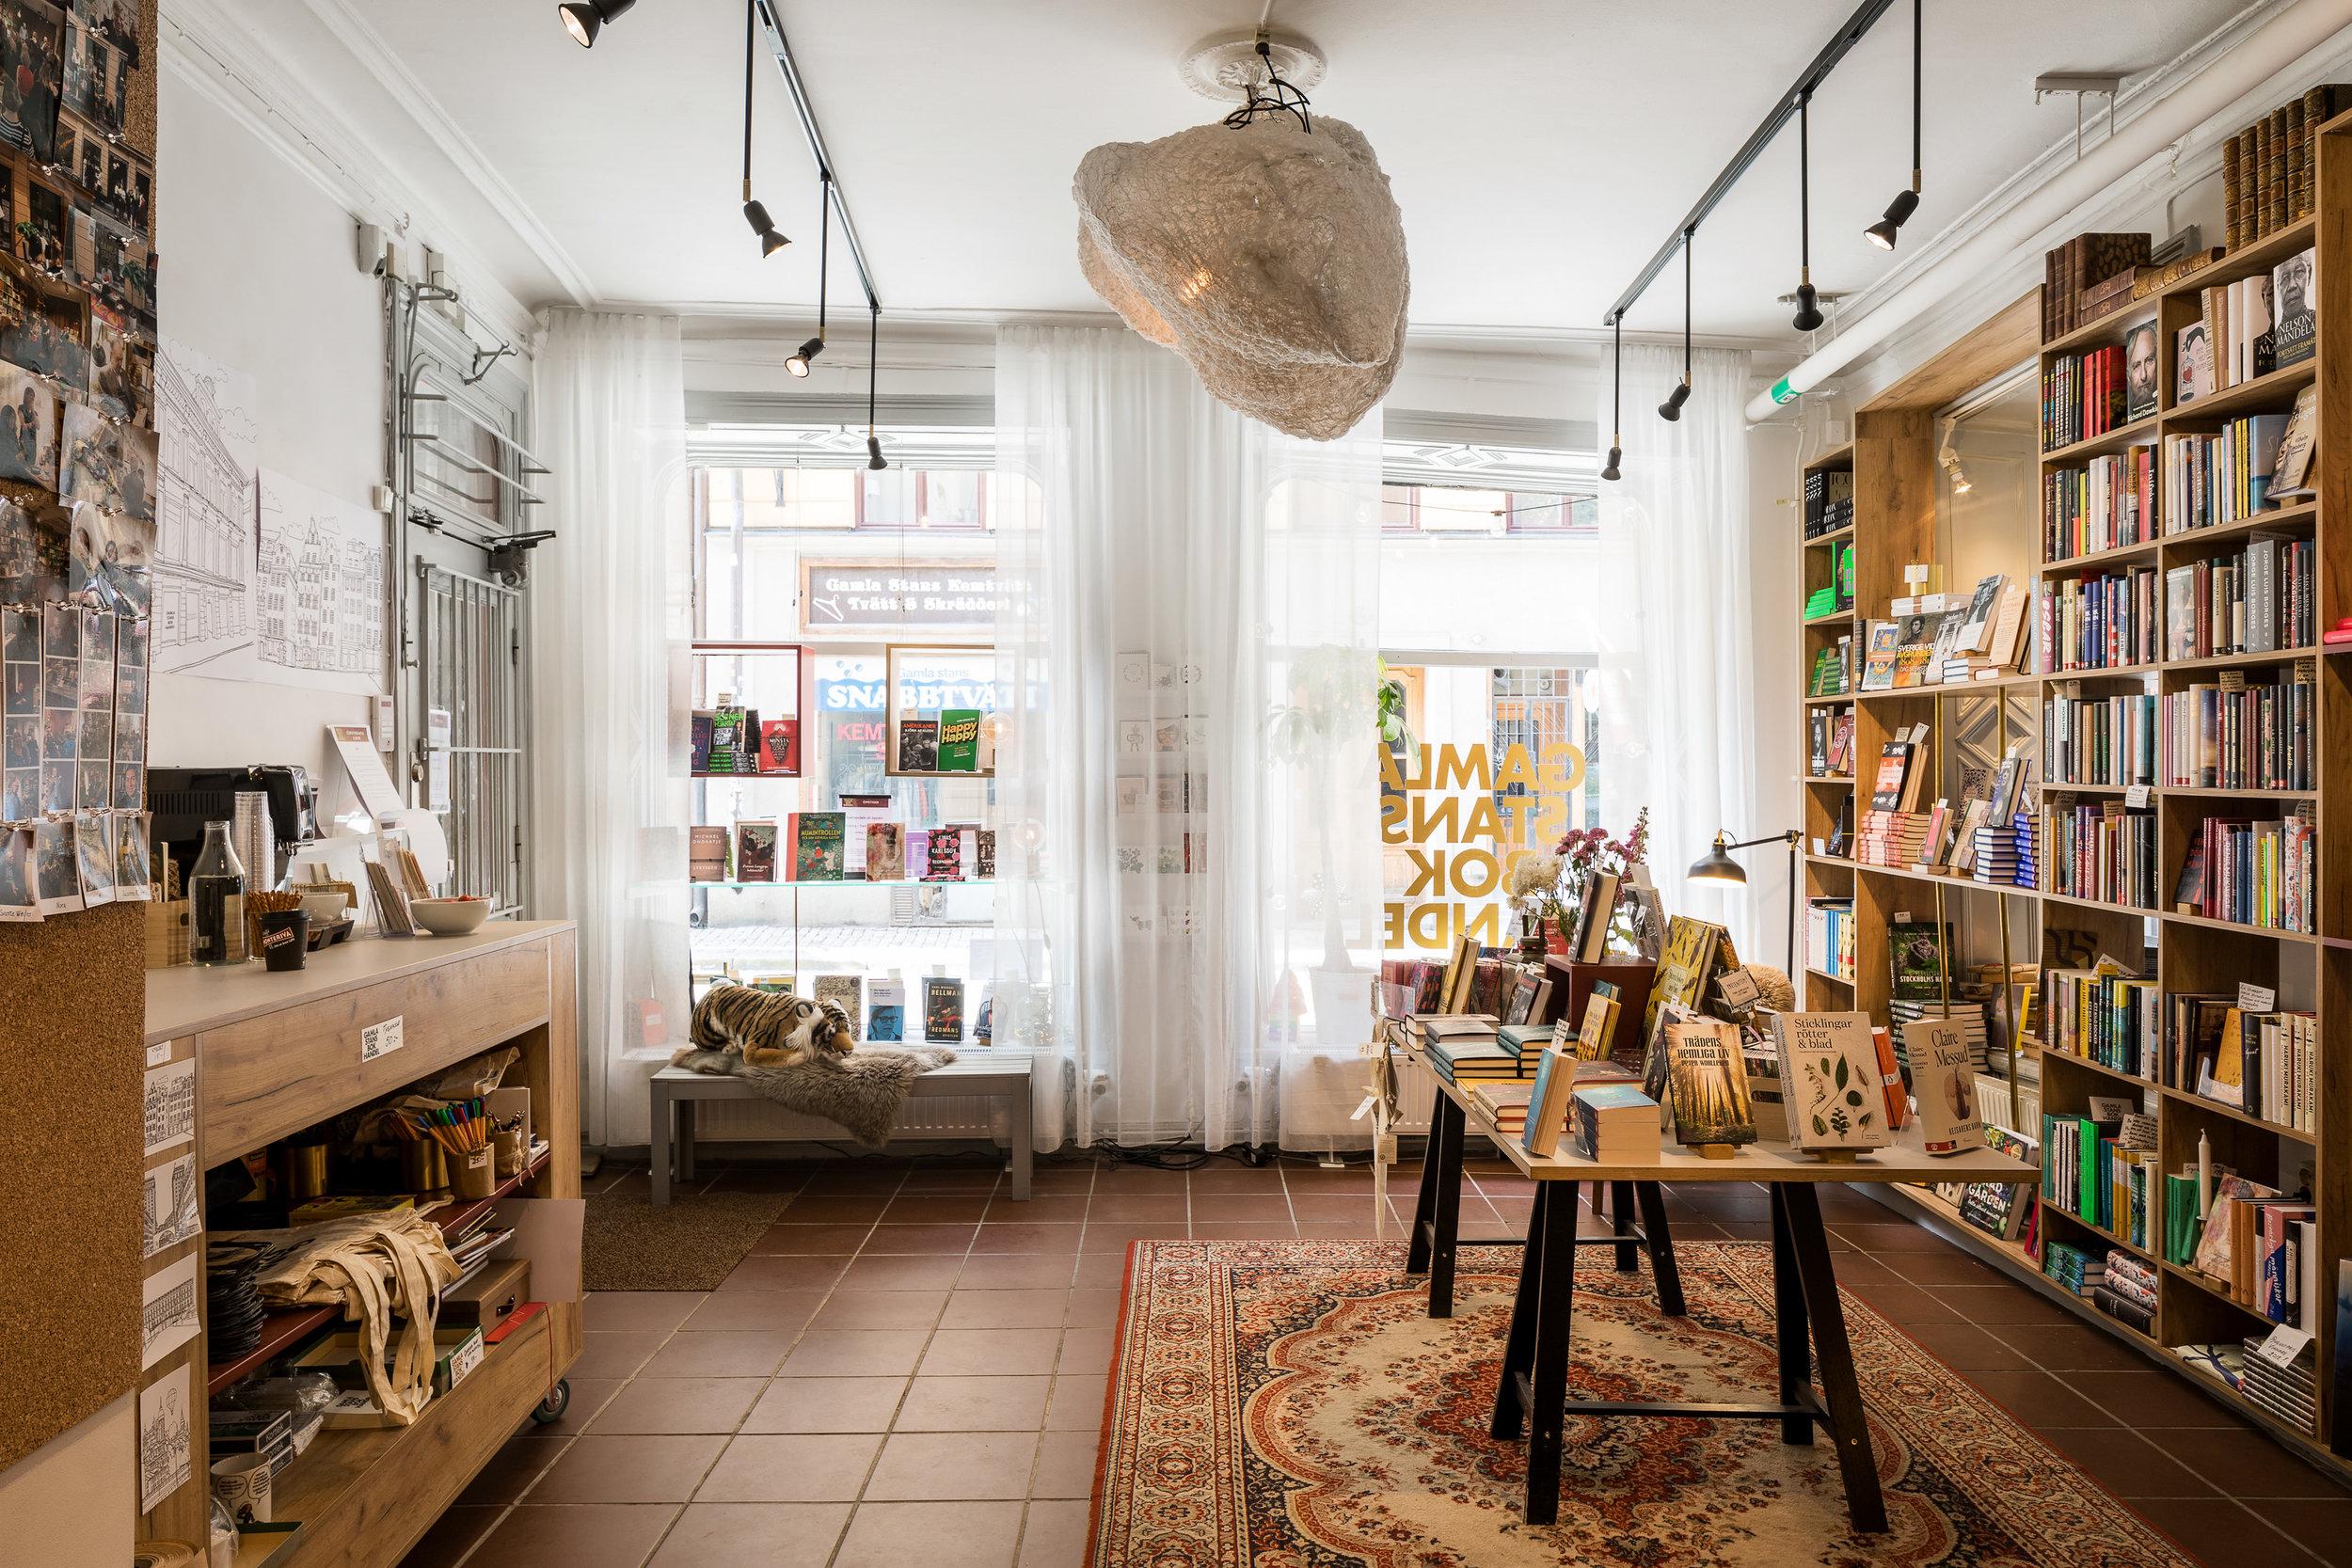 Gamla stans bokhandel / 2016